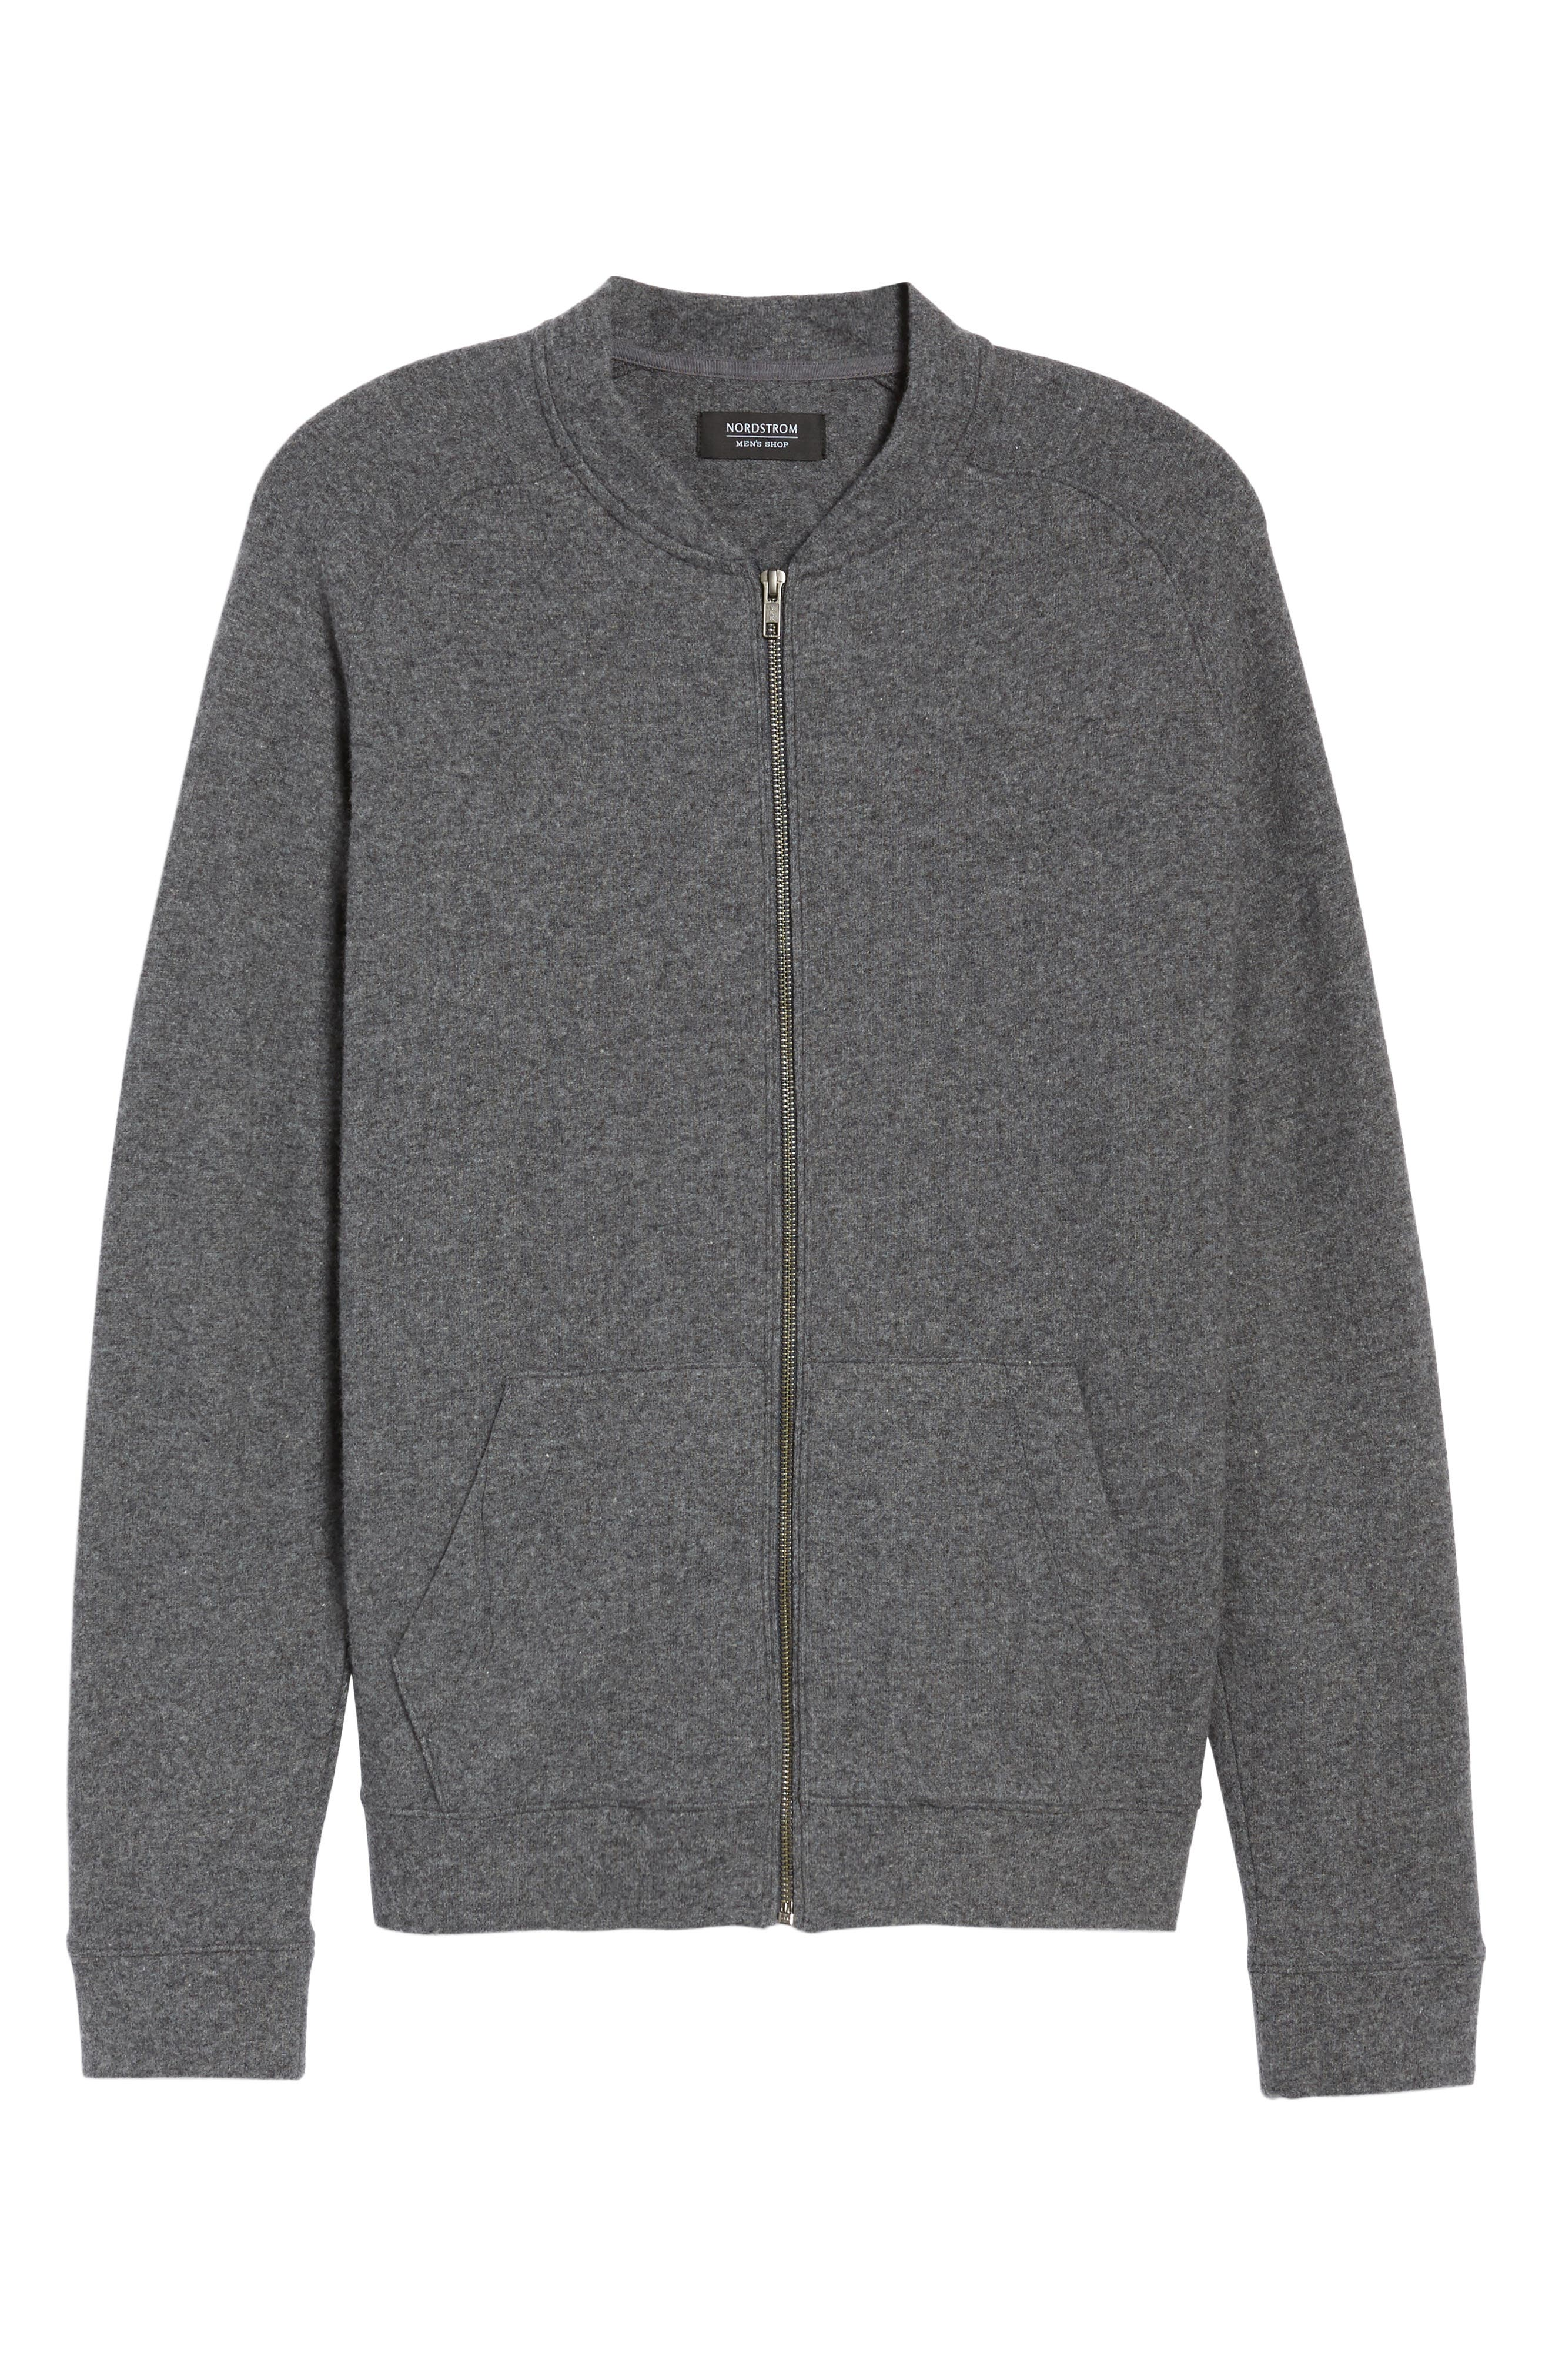 Wool Blend Fleece Bomber Jacket,                             Alternate thumbnail 6, color,                             Grey Charcoal